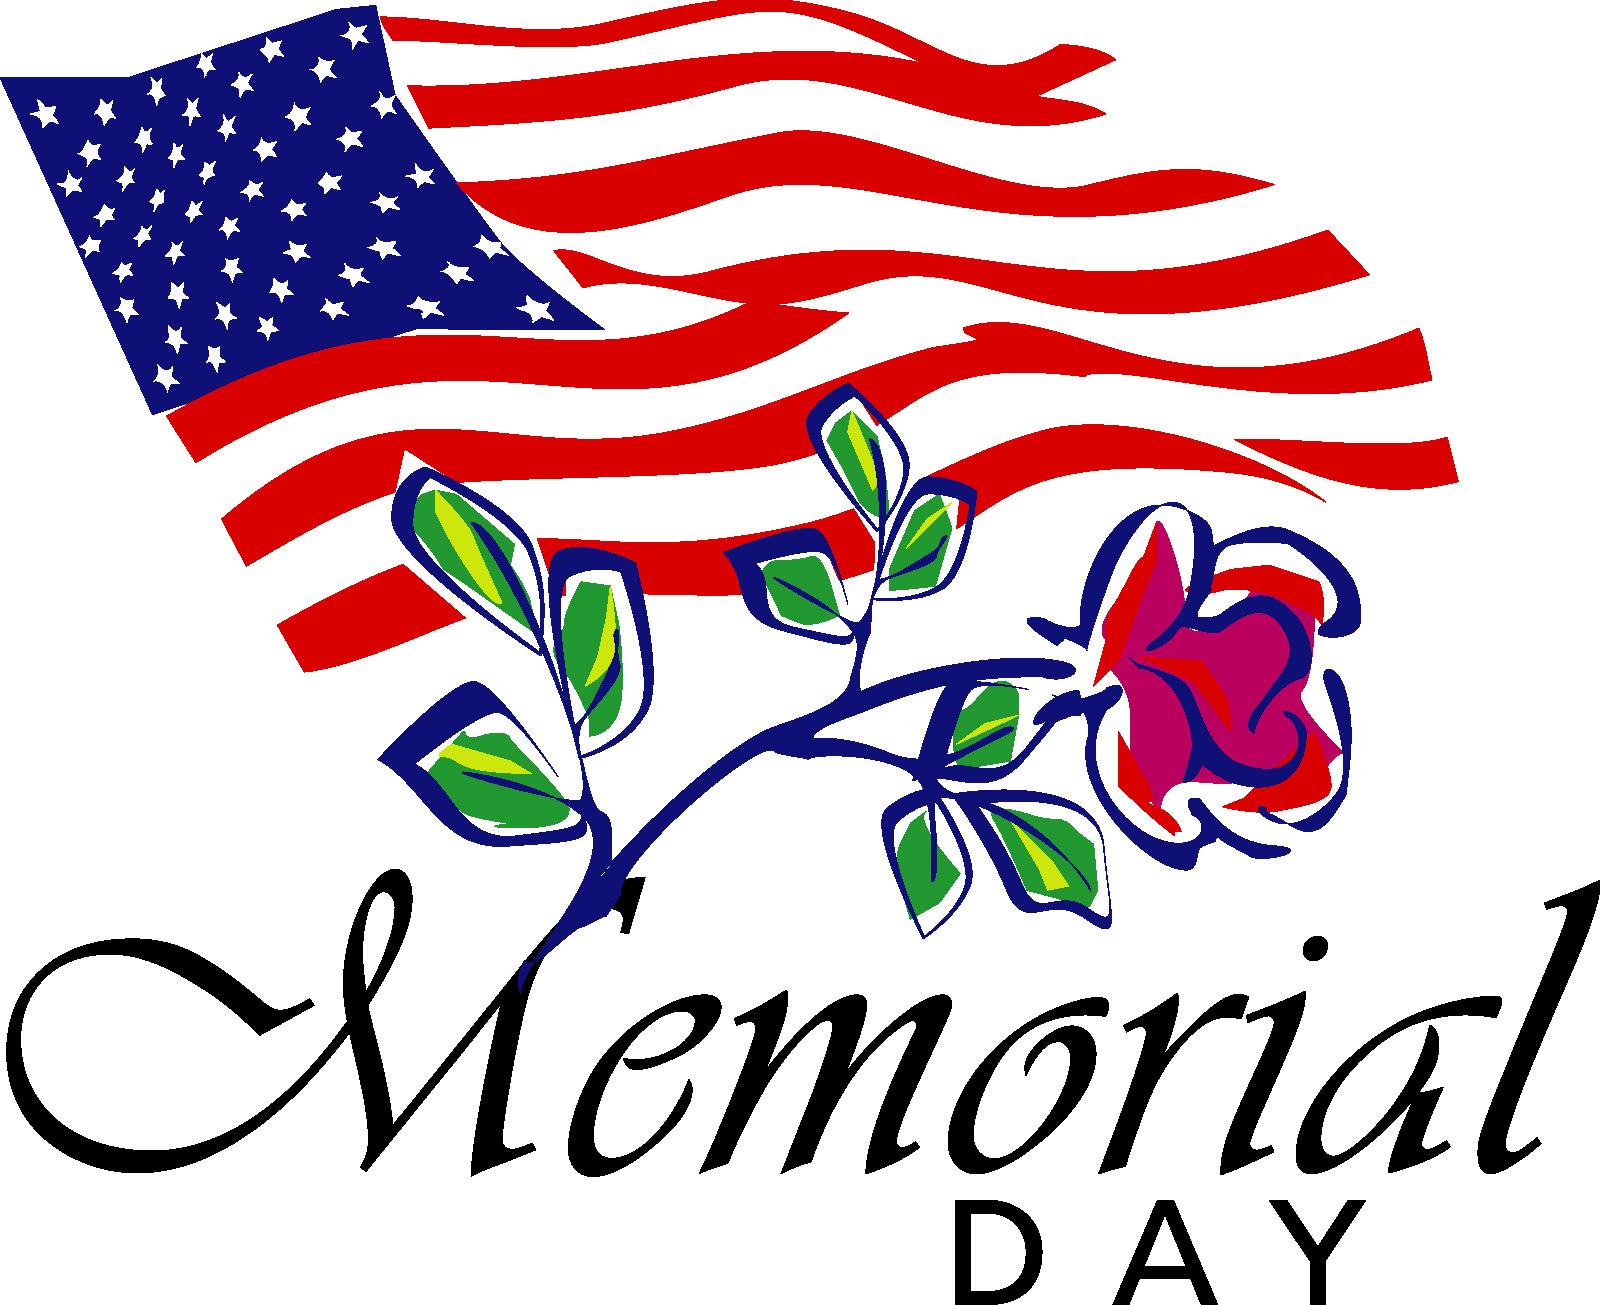 memorial day clipart clipart panda free clipart images rh clipartpanda com clip art memorial day flag clip art memorial day pictures